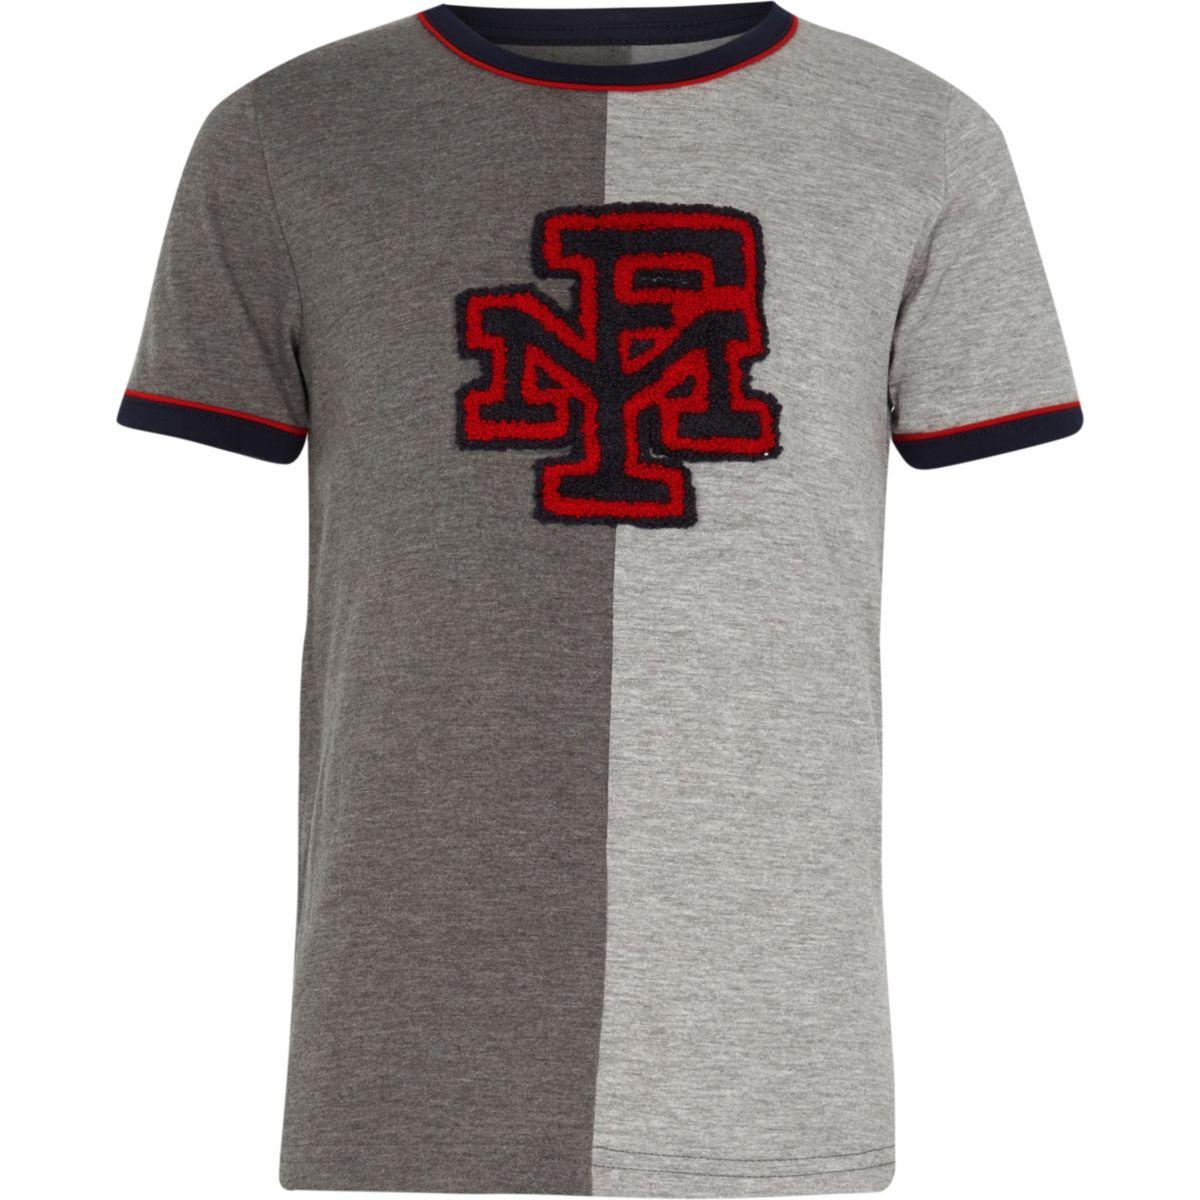 Boys Franklin & Marshall grey T-shirt